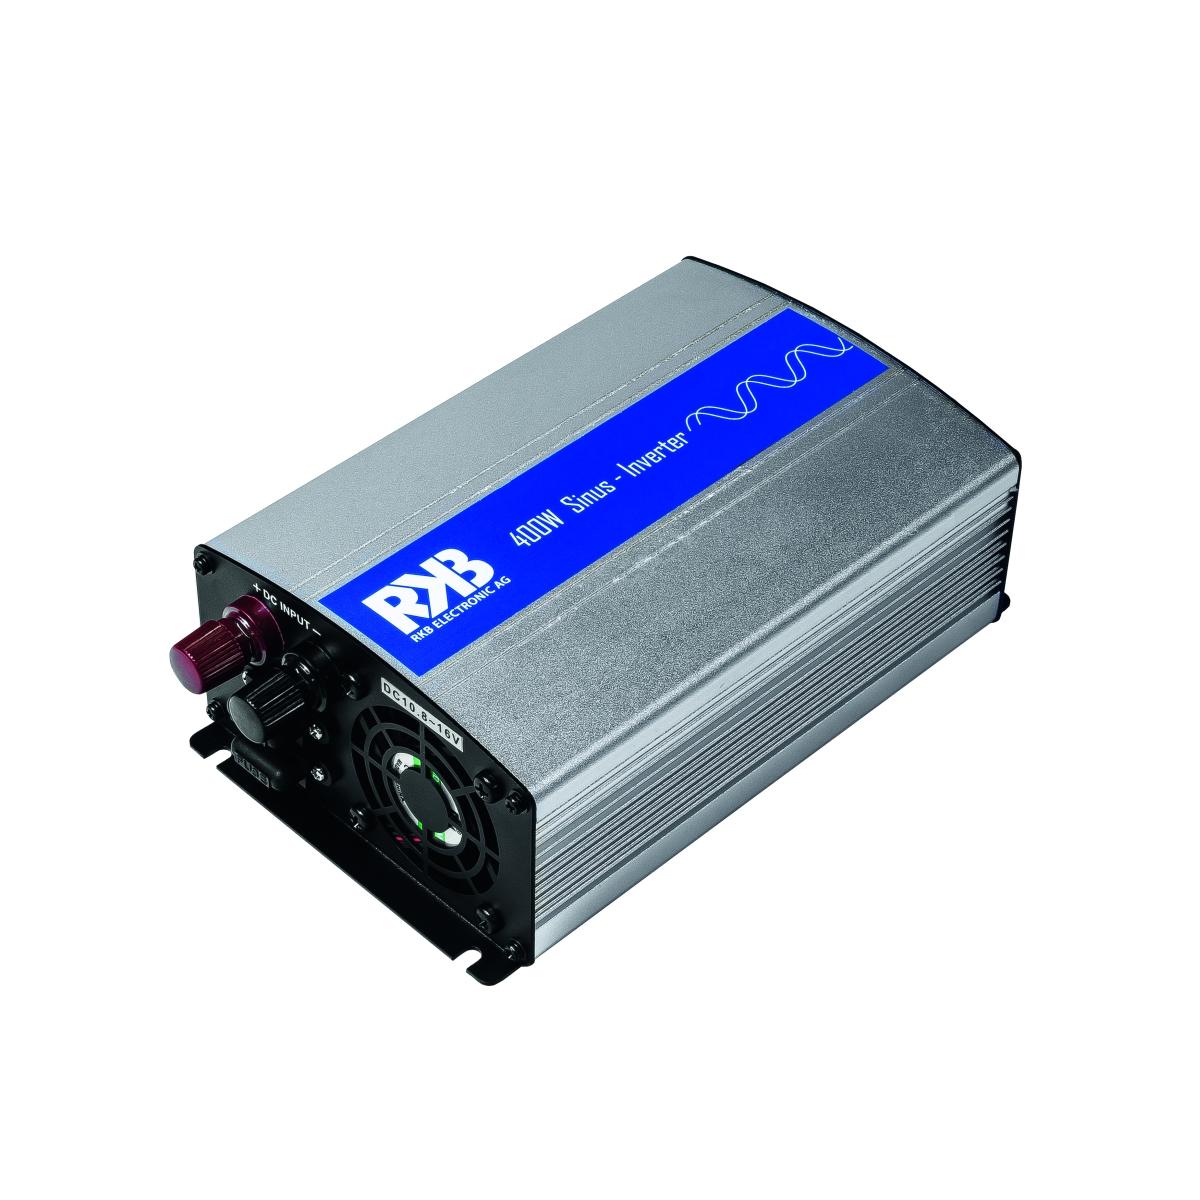 ProUser Sinus-Wechselrichter RKB 400-12